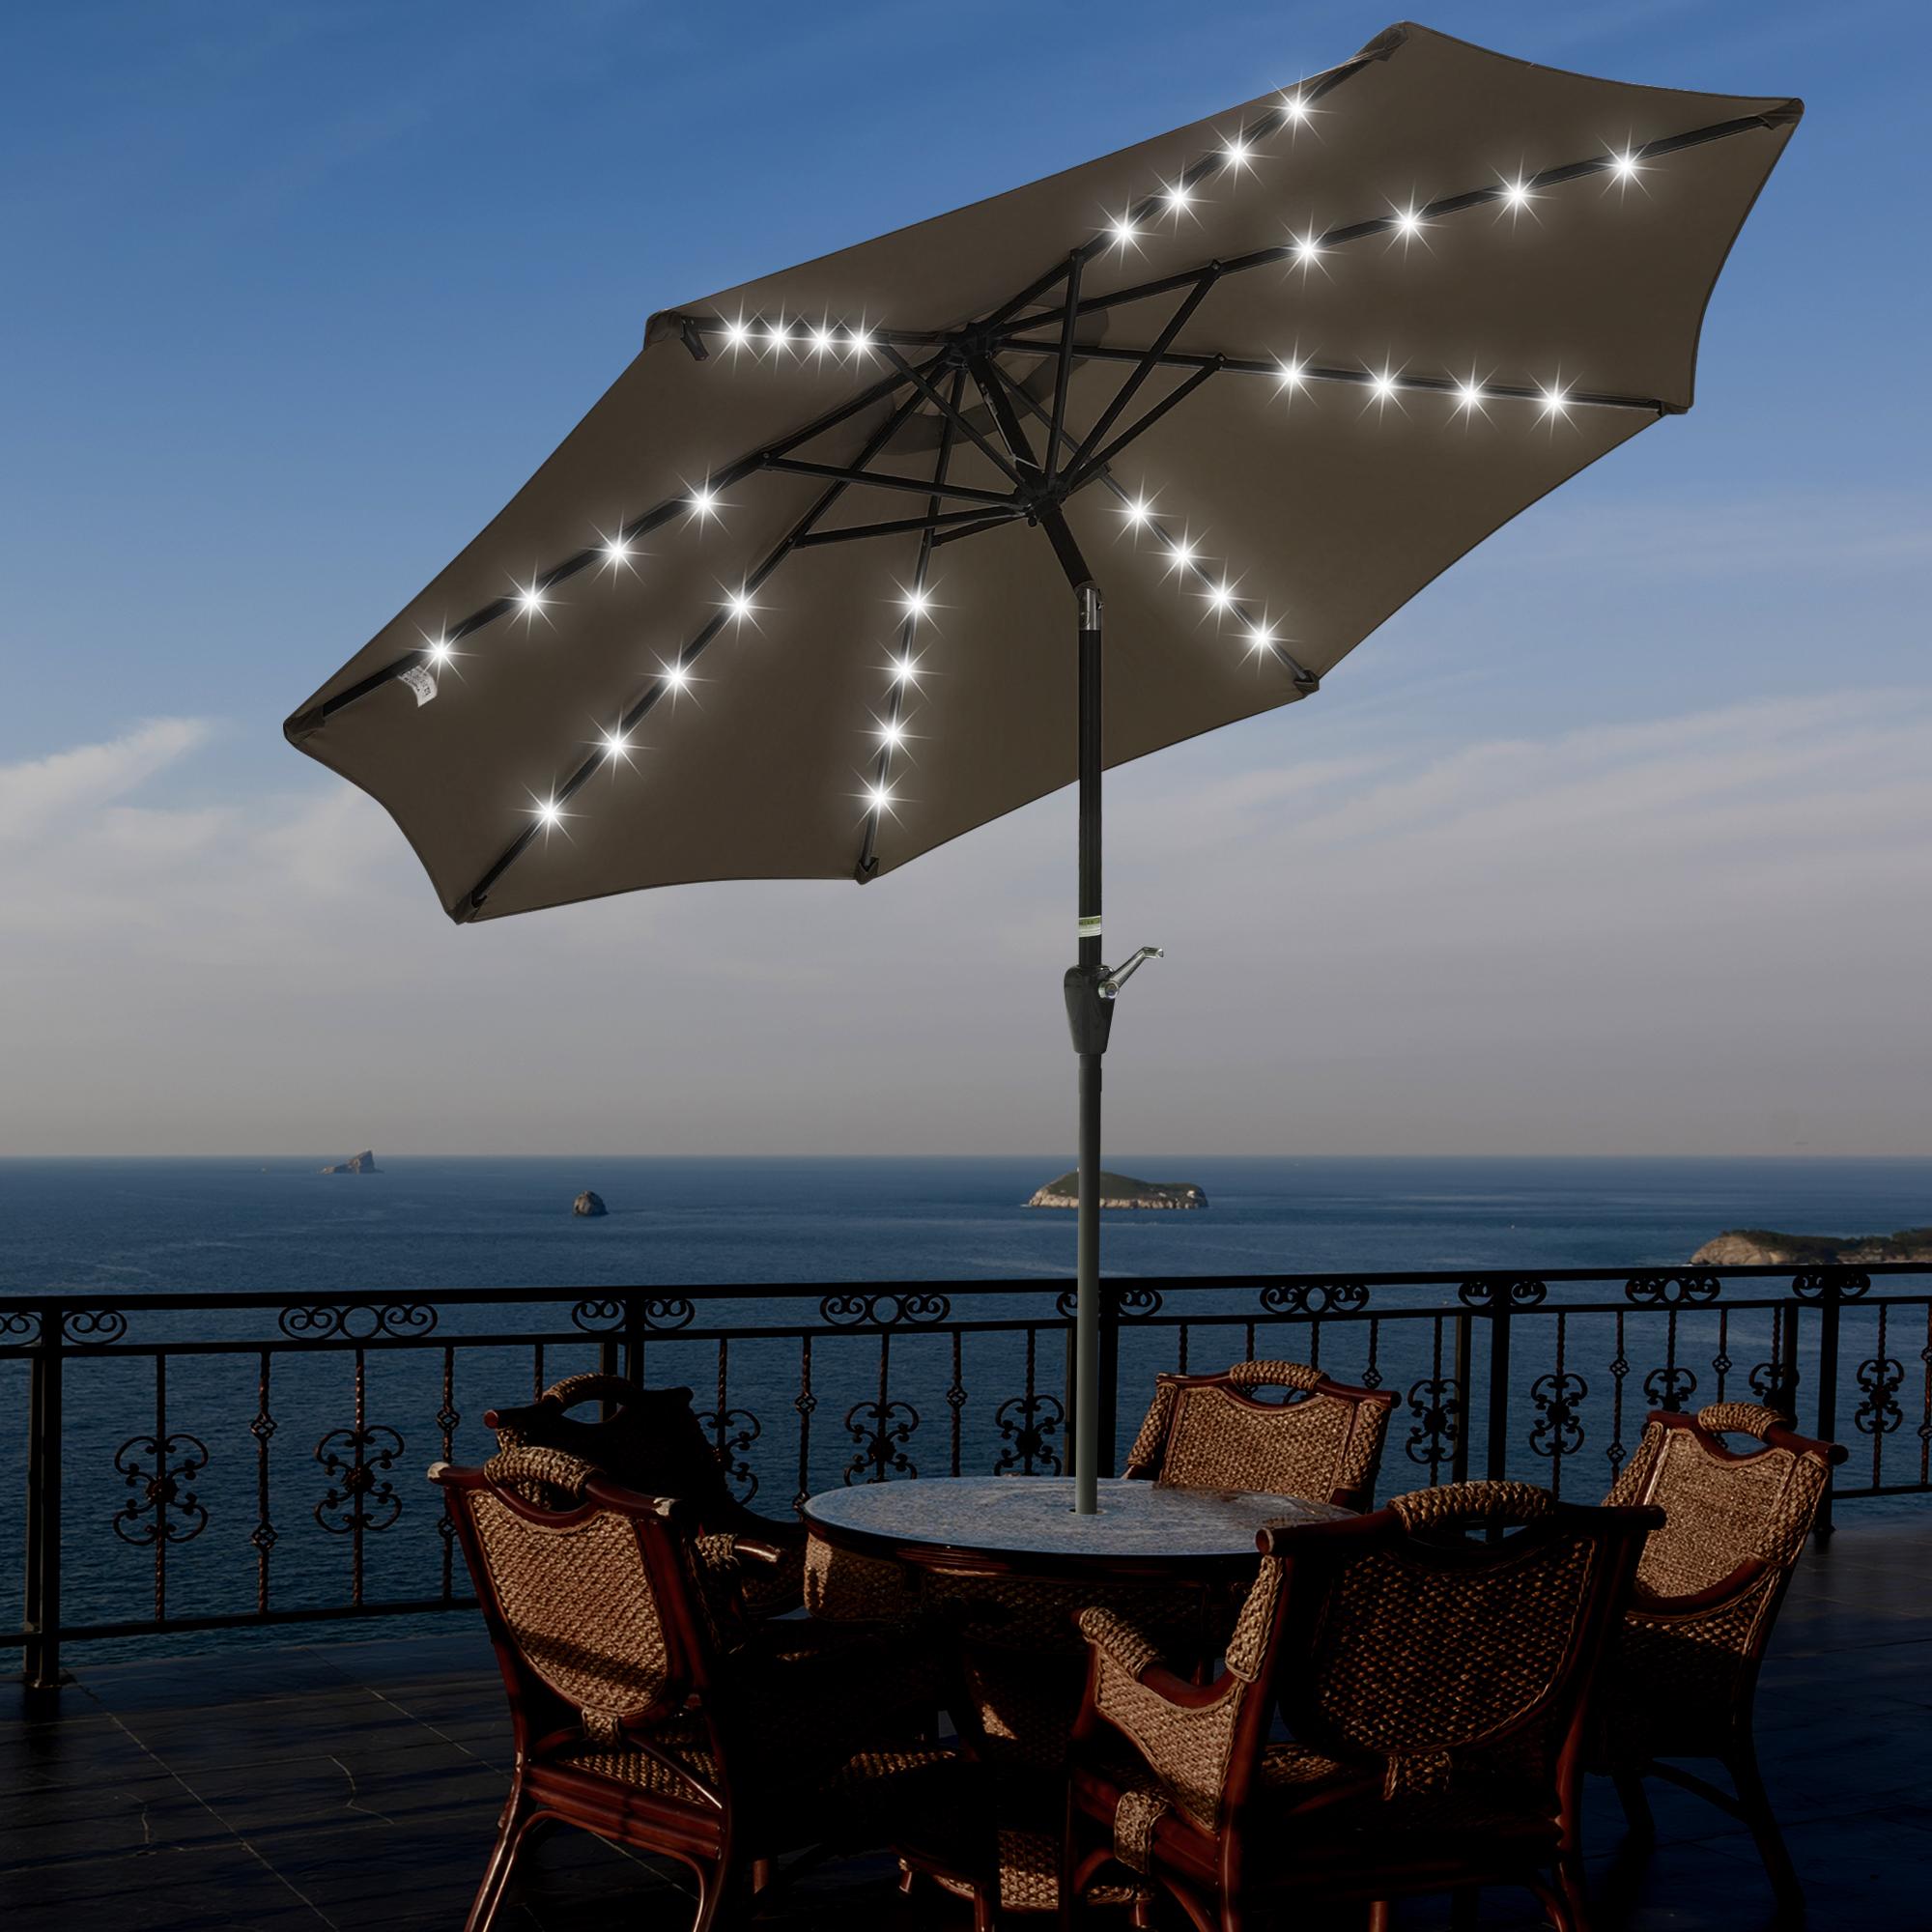 thumbnail 44 - 9' Patio Outdoor Umbrella Solar LED 8 Rib Garden Parasol Yard Deck Table Shade